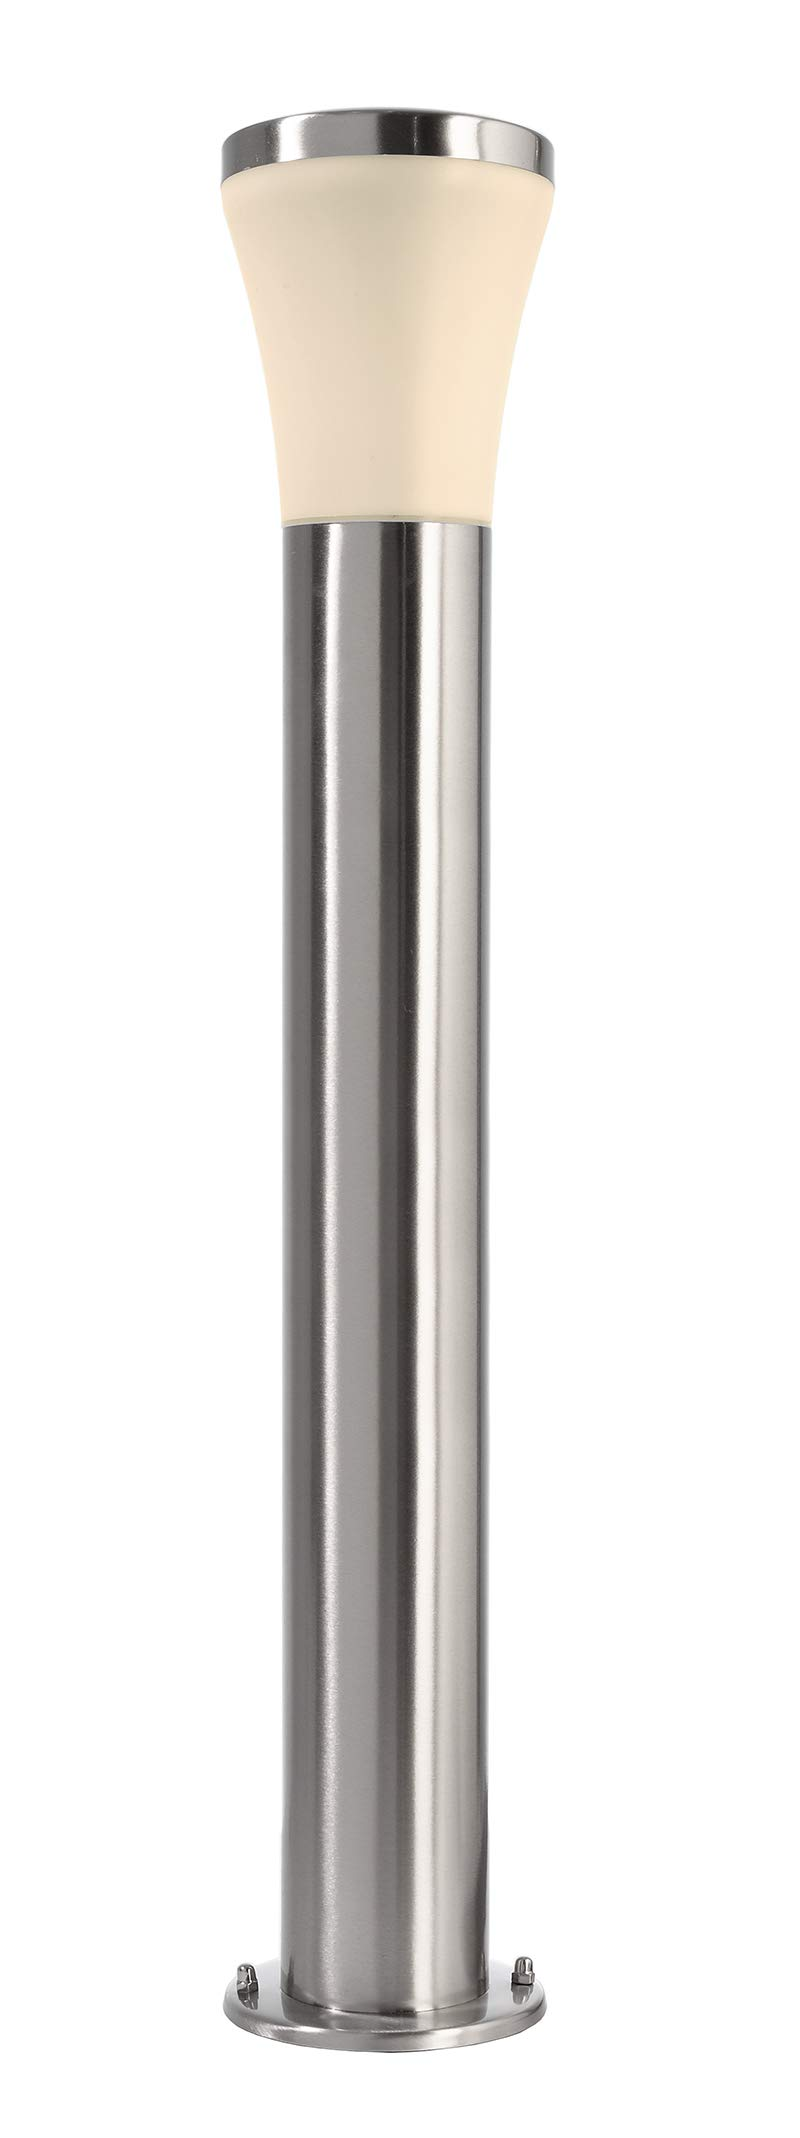 MW-Light 803040601 Lámpara de Pie Para Exterior Clásico de Metal y ...